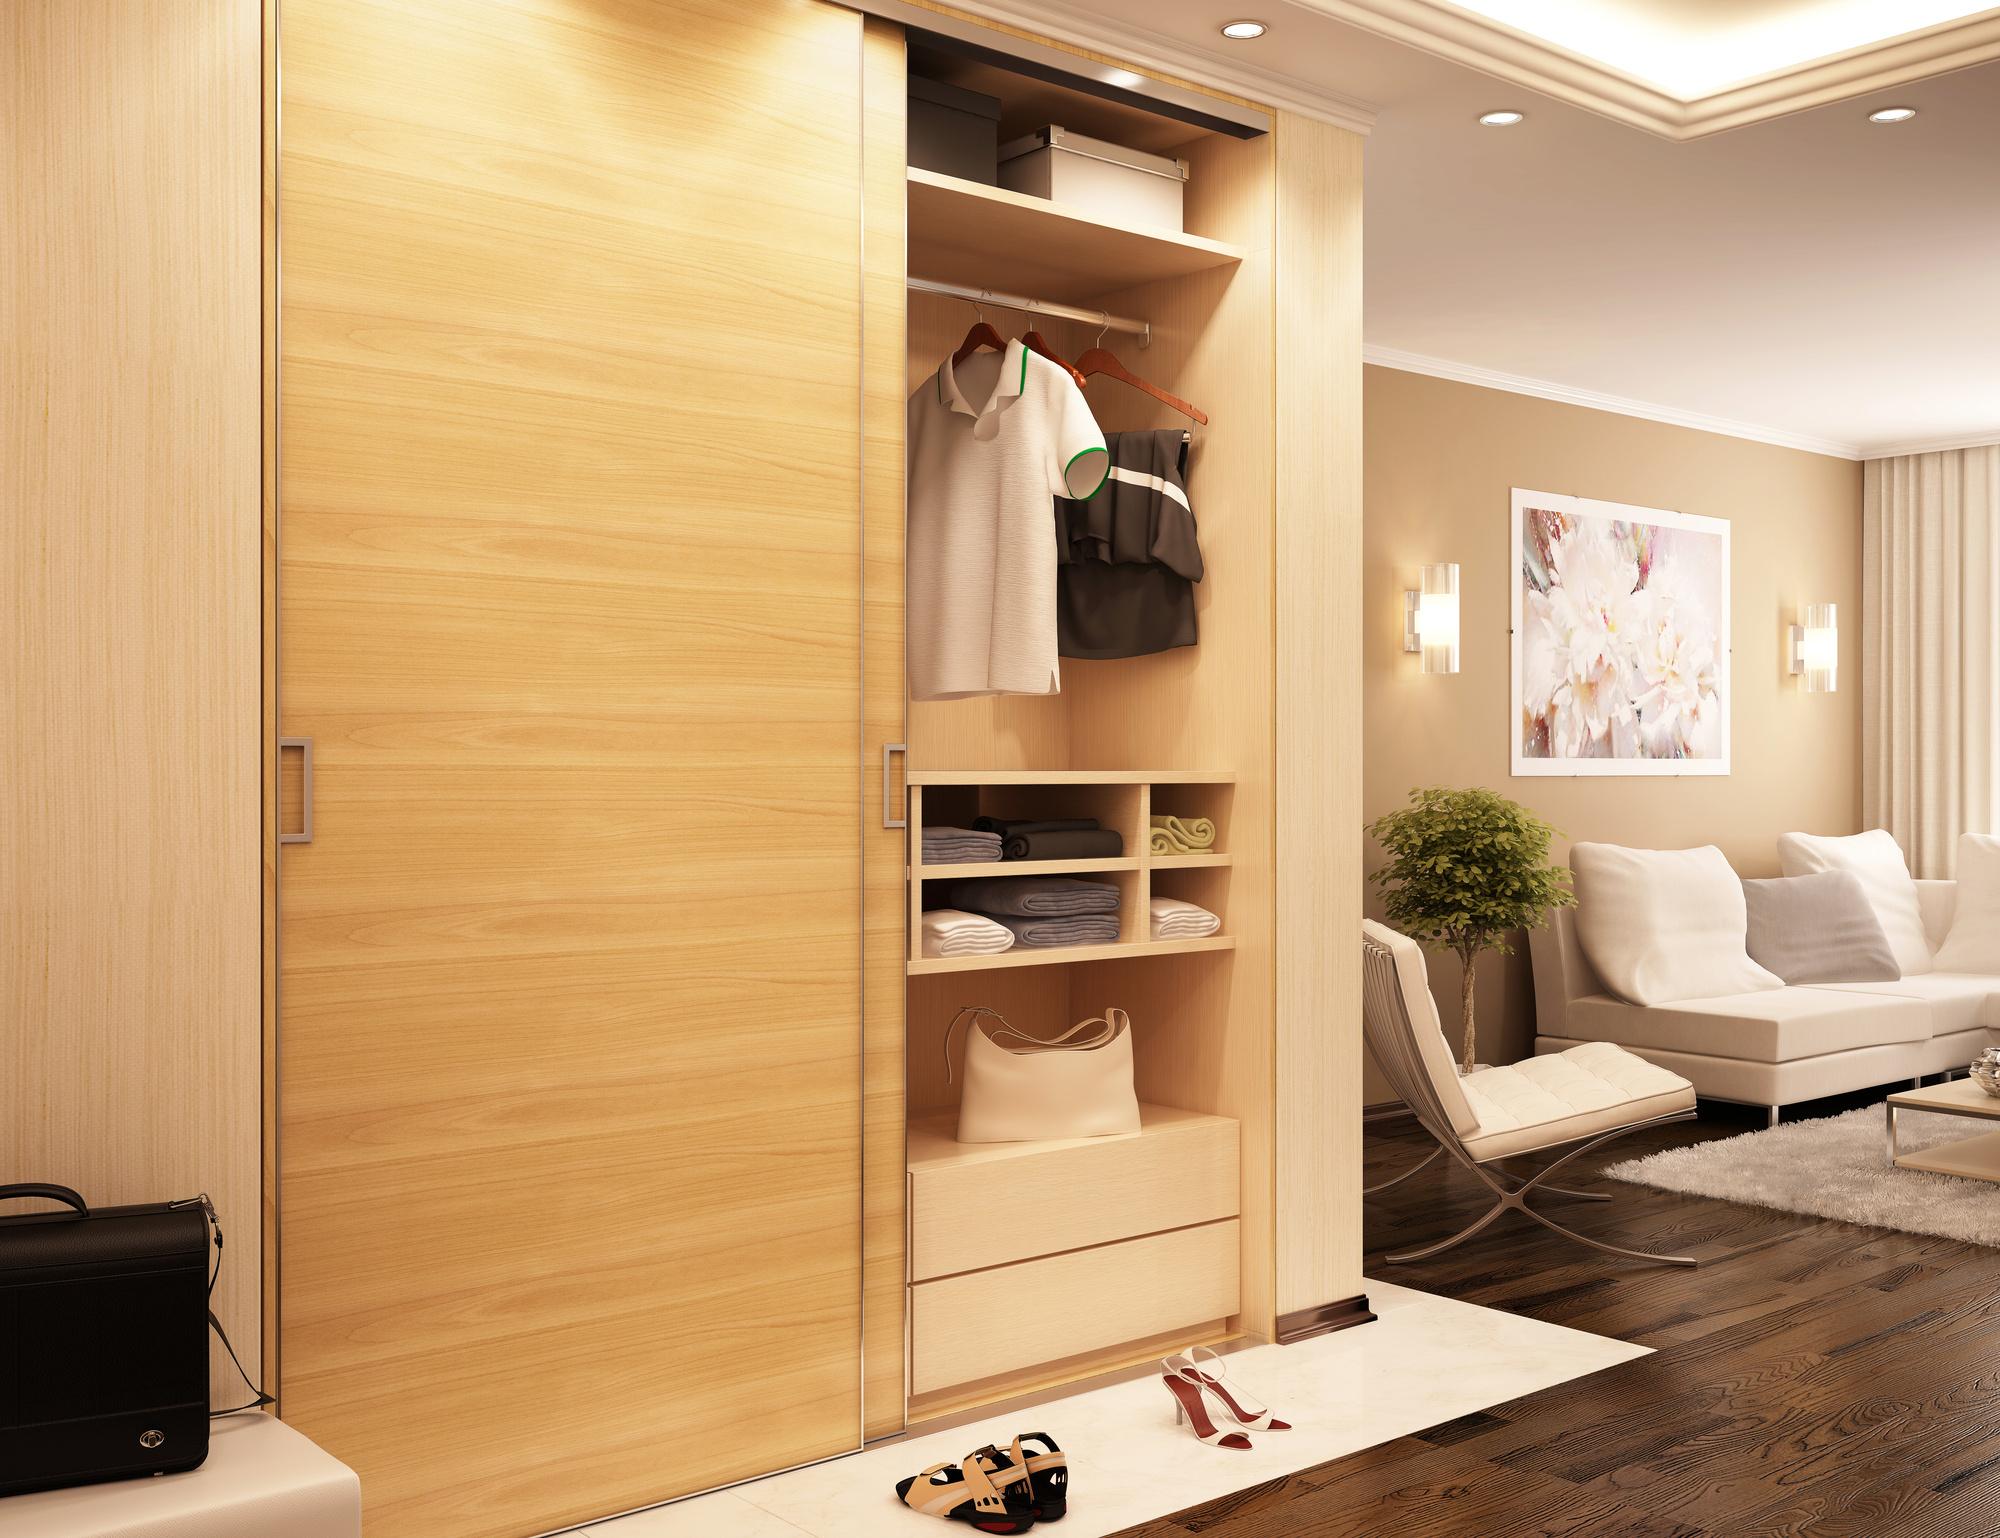 Top 5 Benefits Of Sliding Wardrobe Doors Interior Design Tours